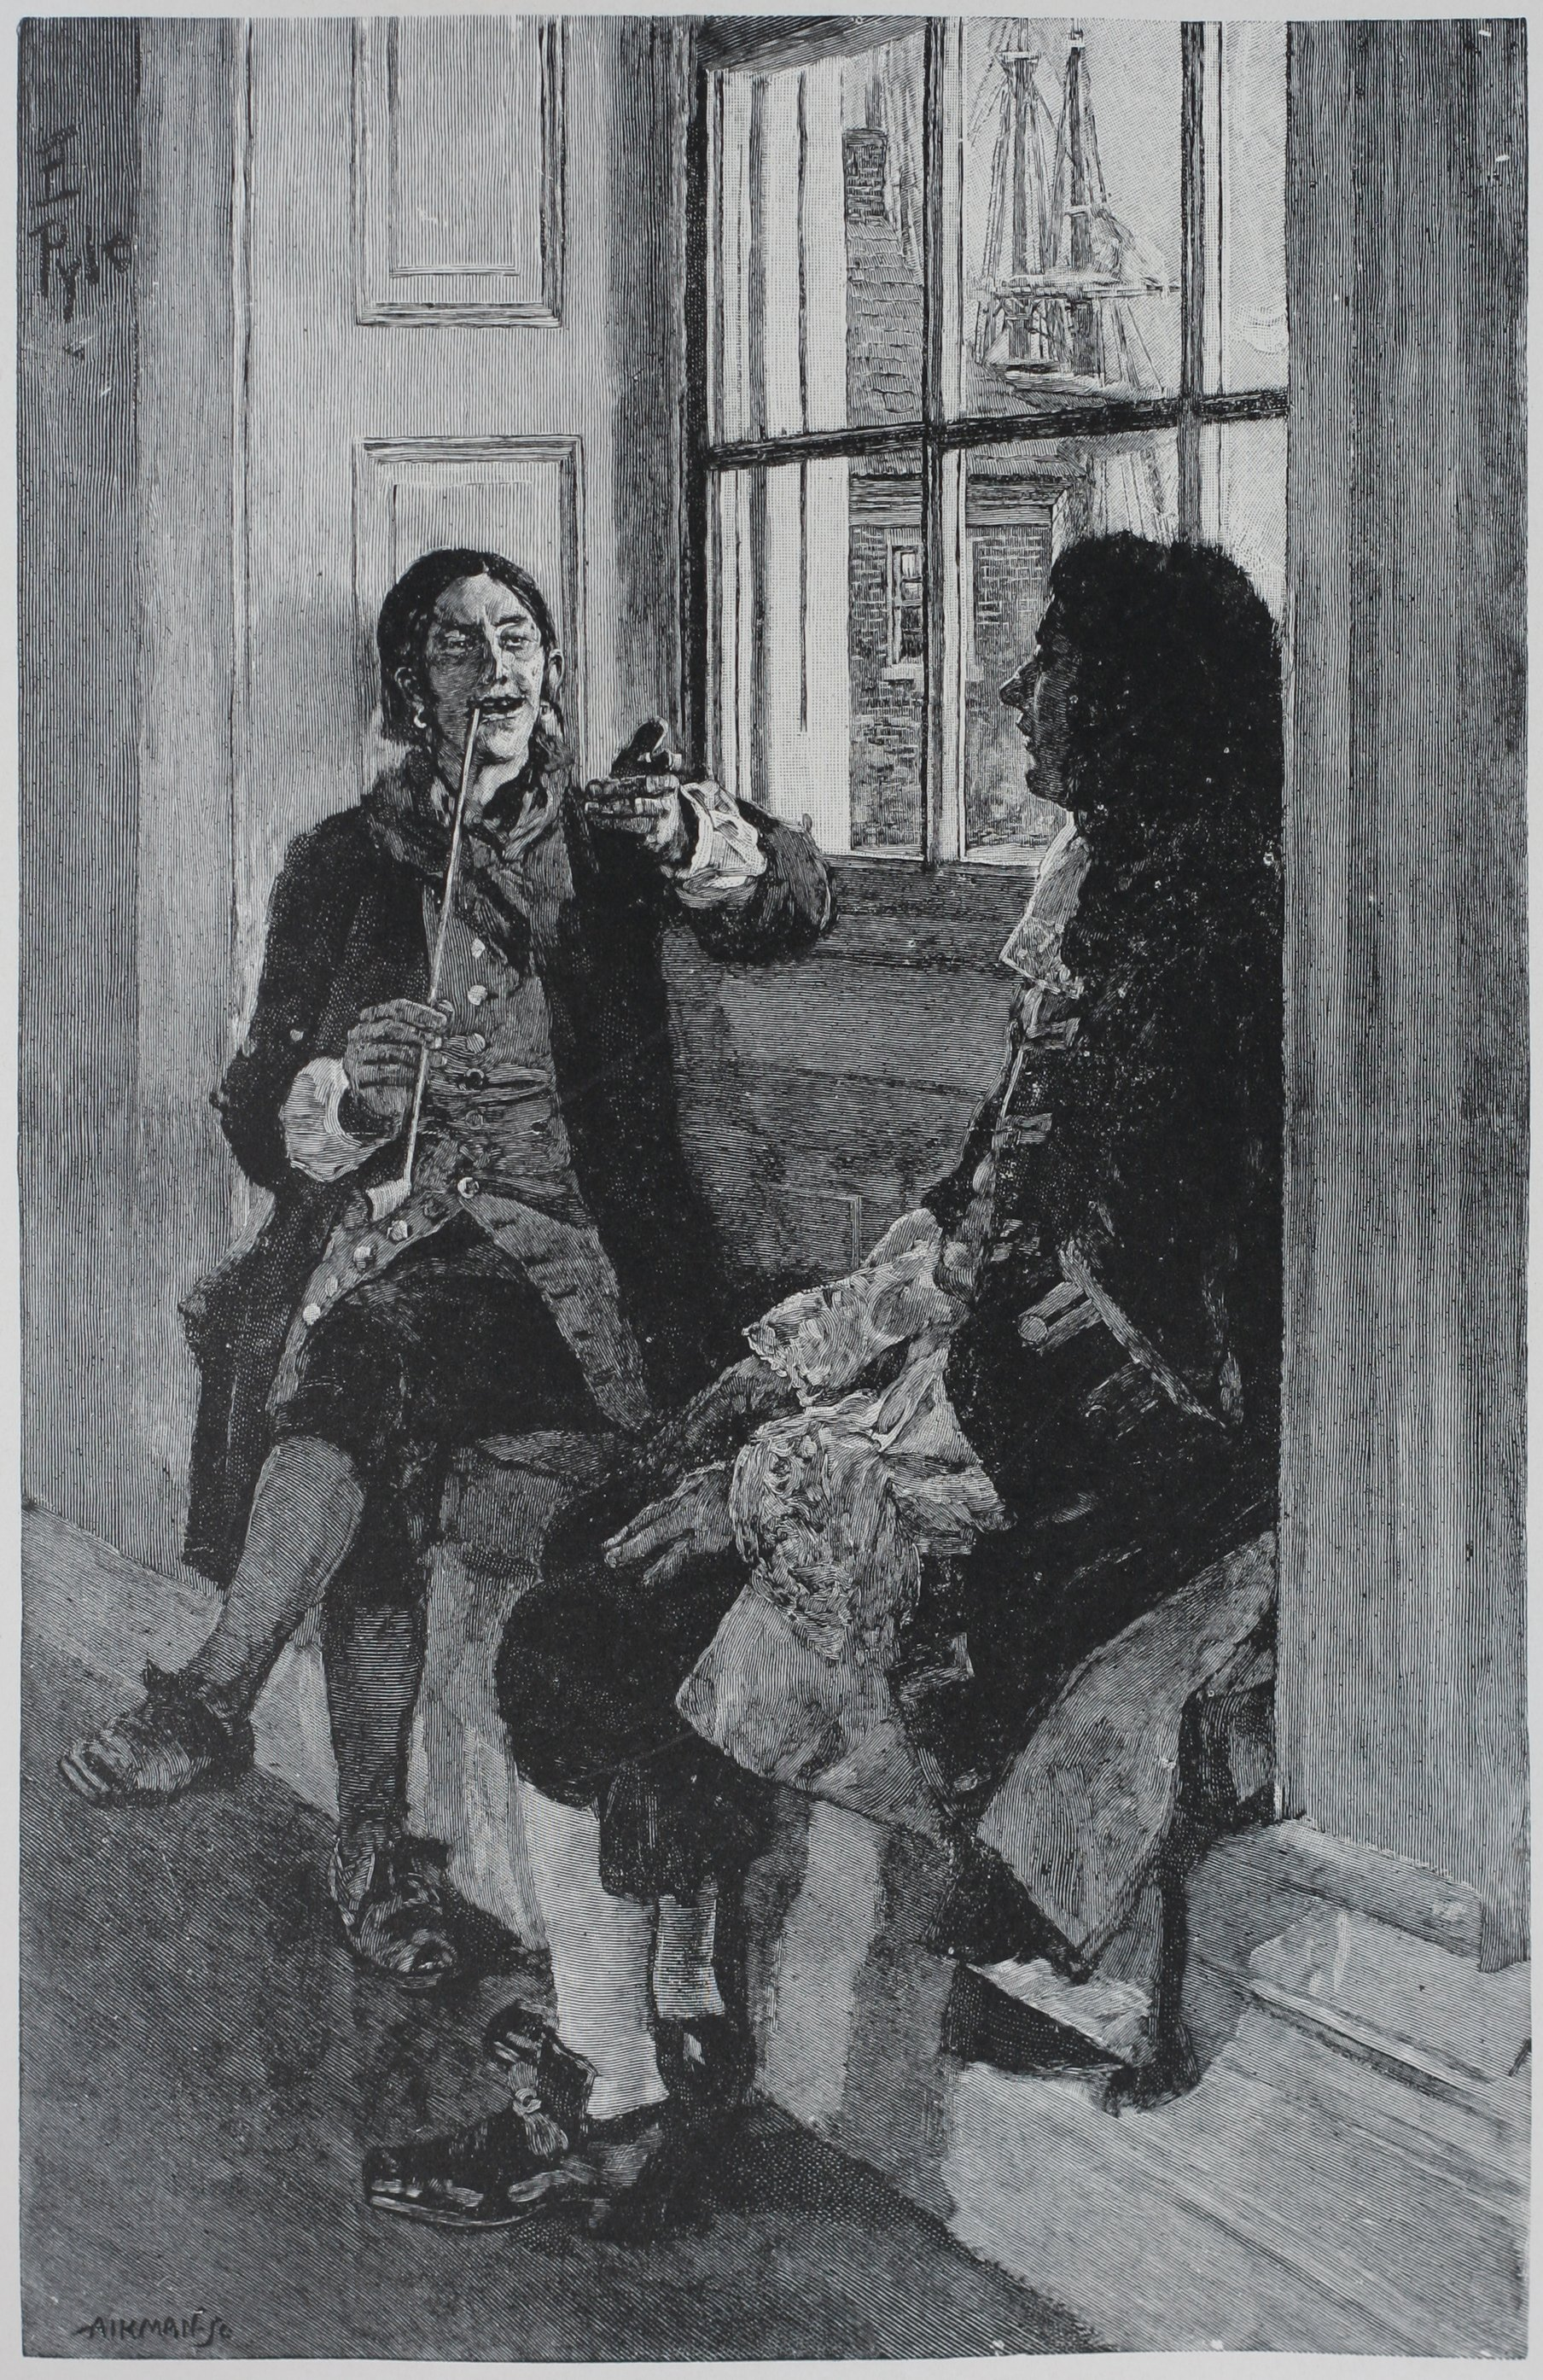 Thomas Tew Pirate Tale